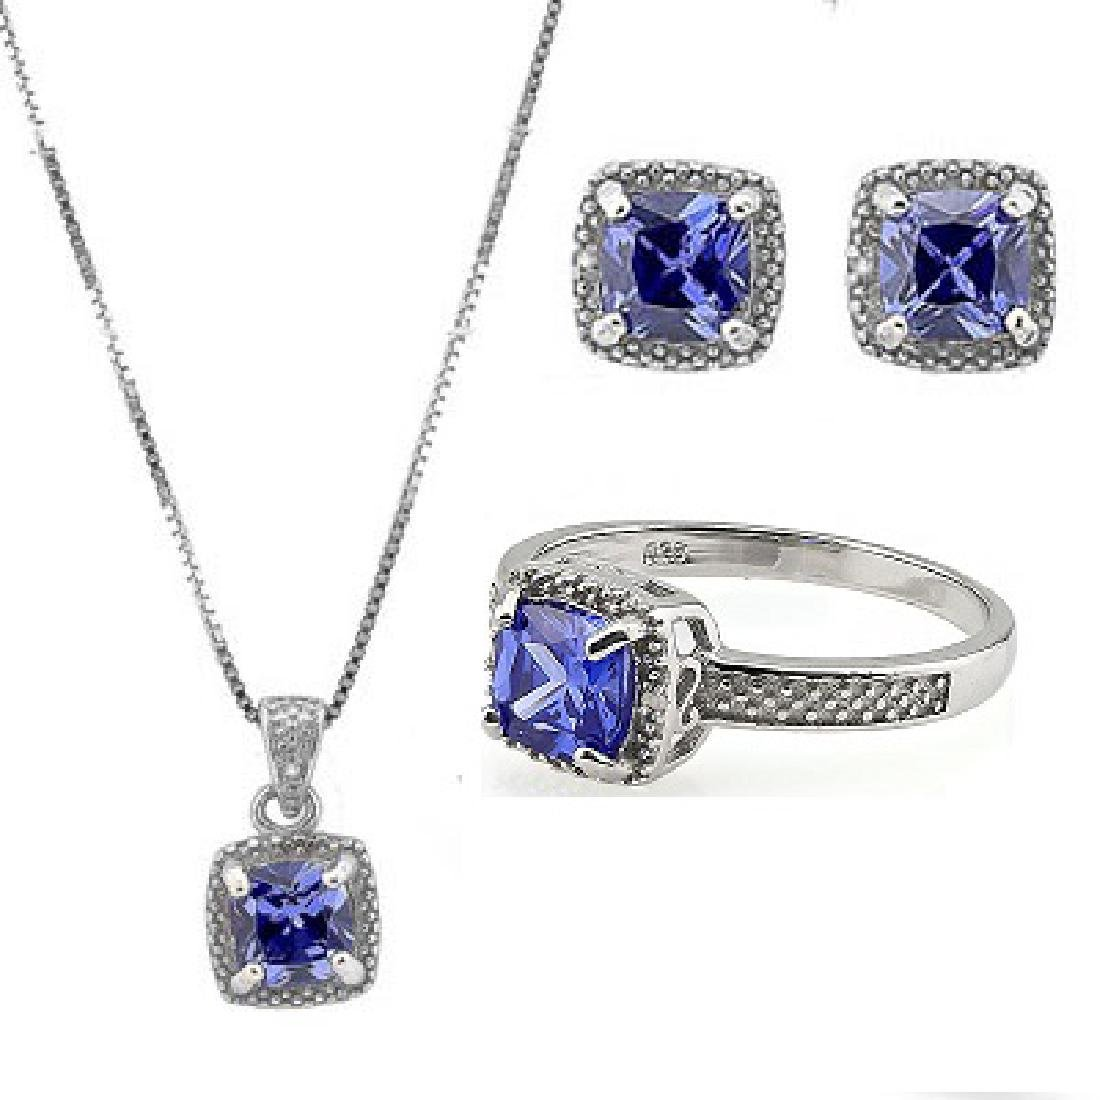 6 1/2 CARAT LAB TANZANITE & DIAMOND 925 STERLING SILVER